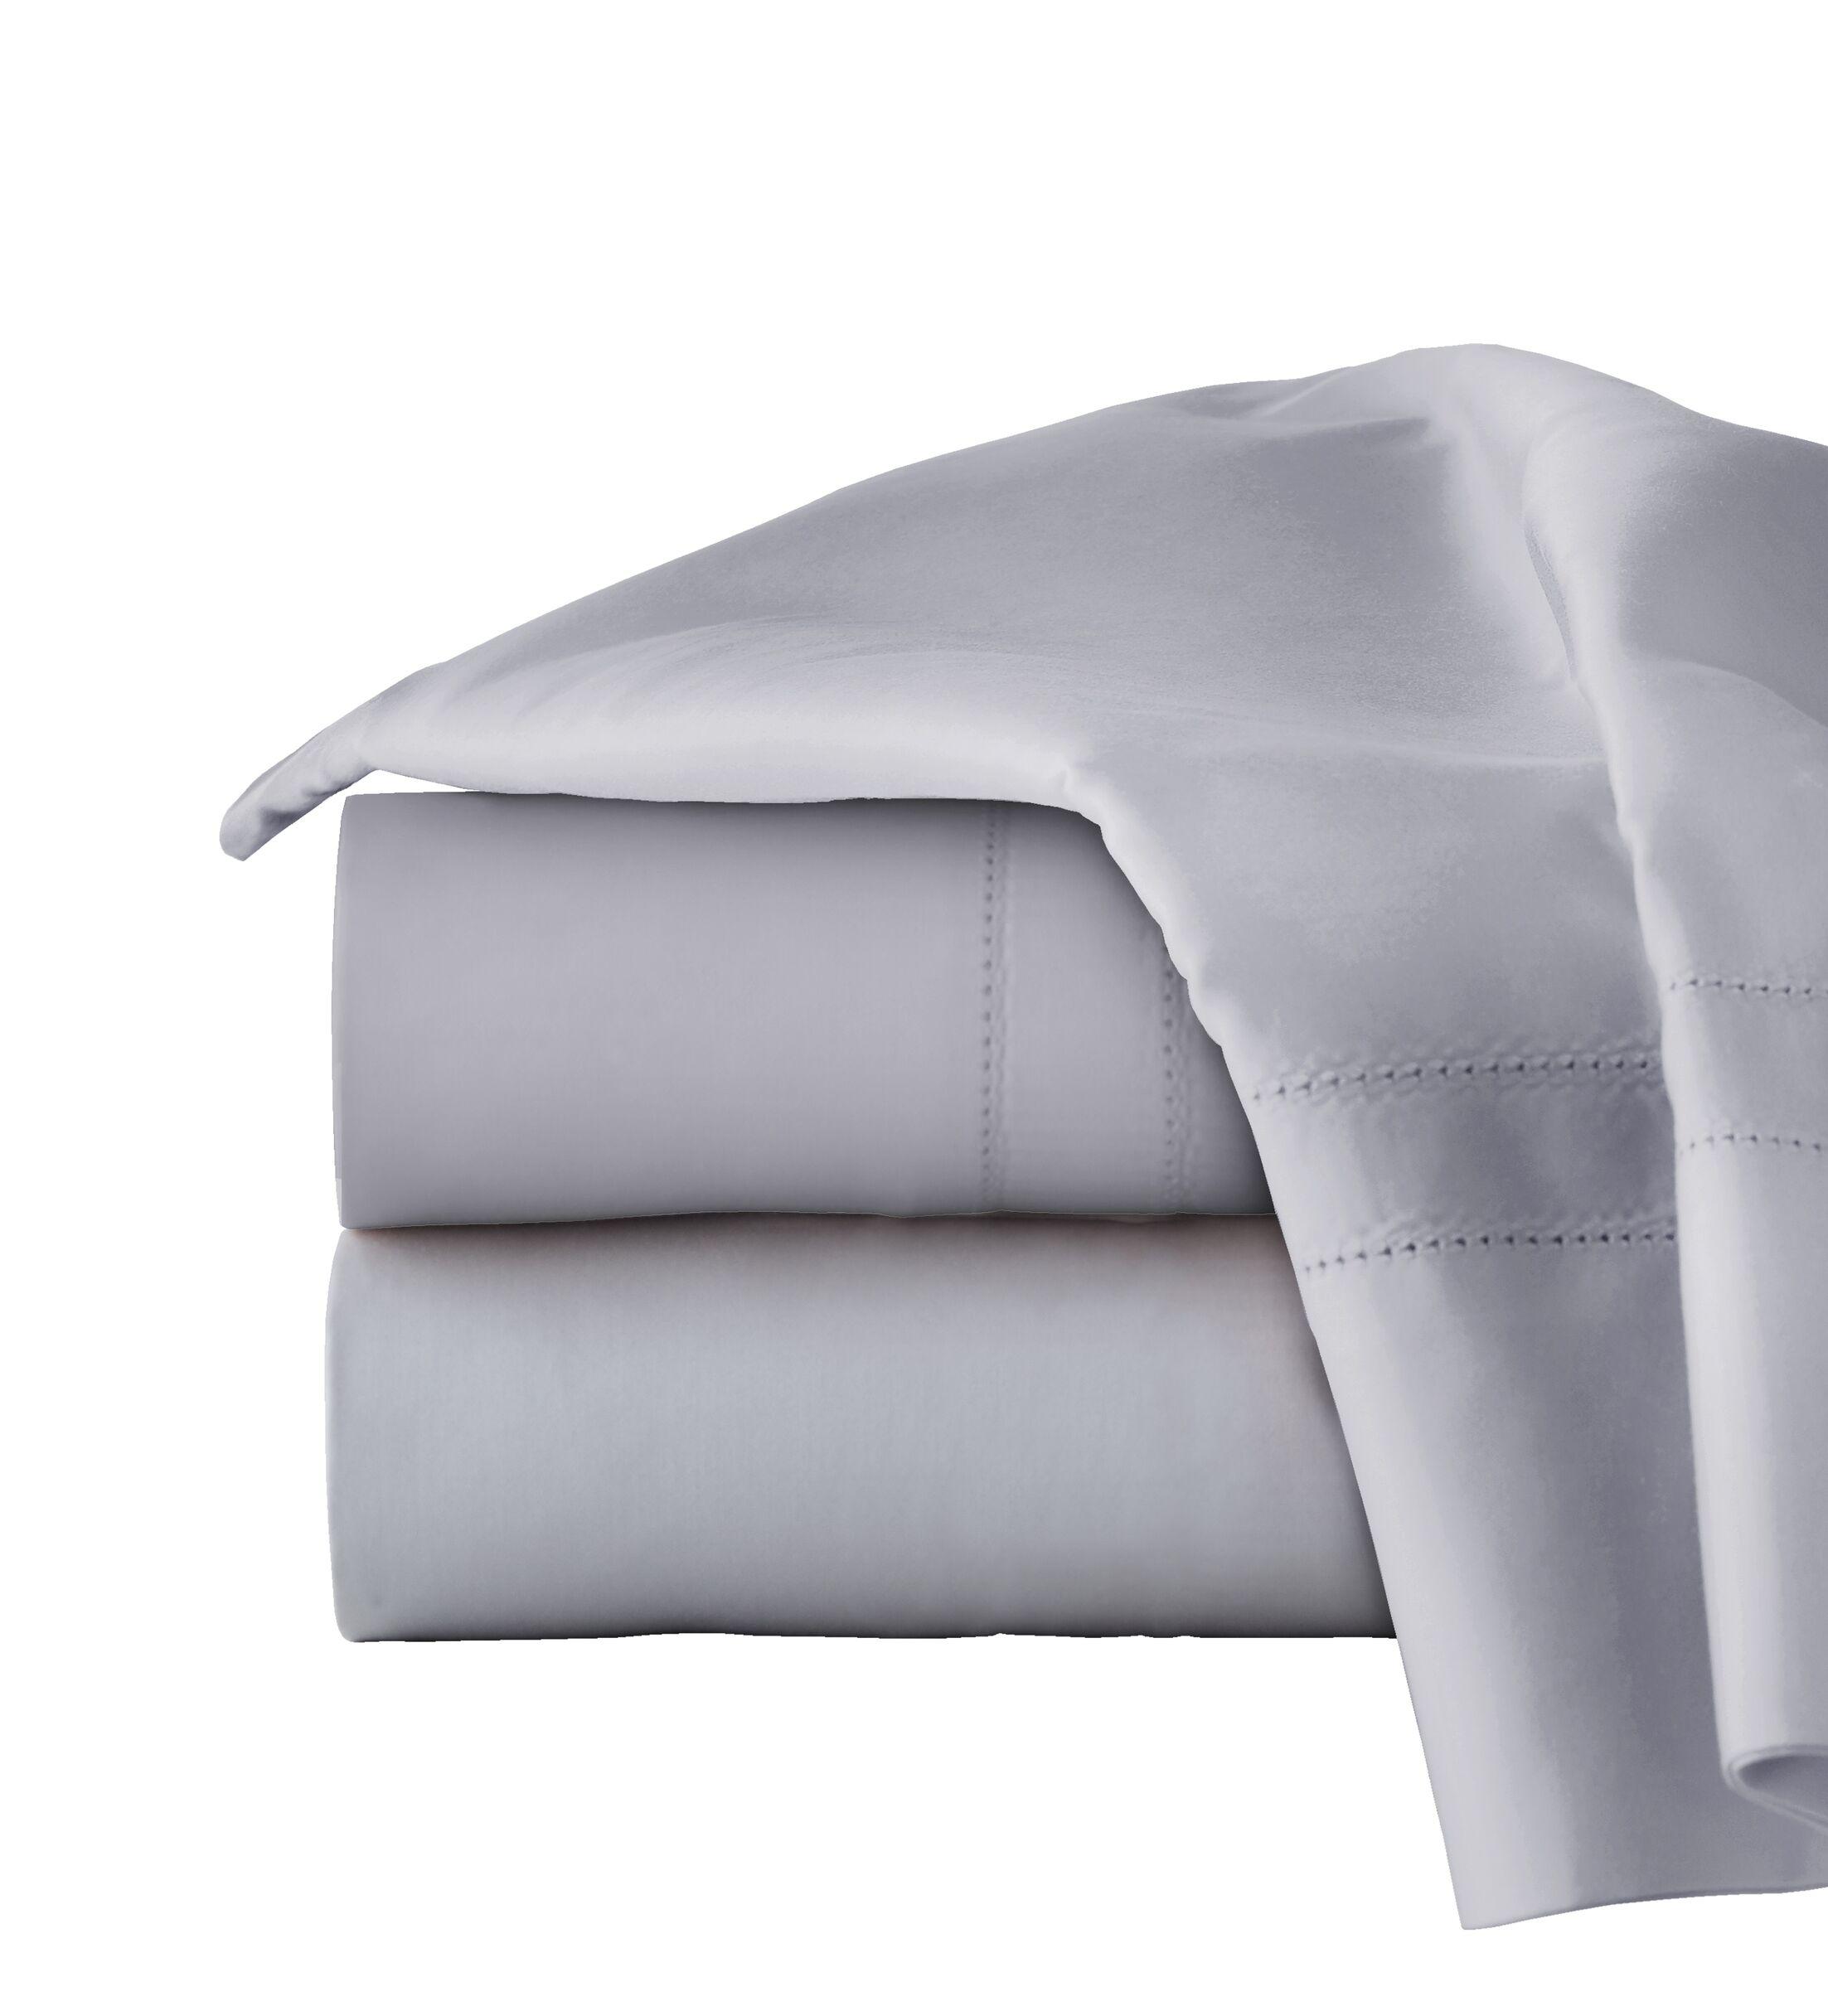 620 Thread Long Staple Count 100% Cotton Sheet Set Color: Gray, Size: King